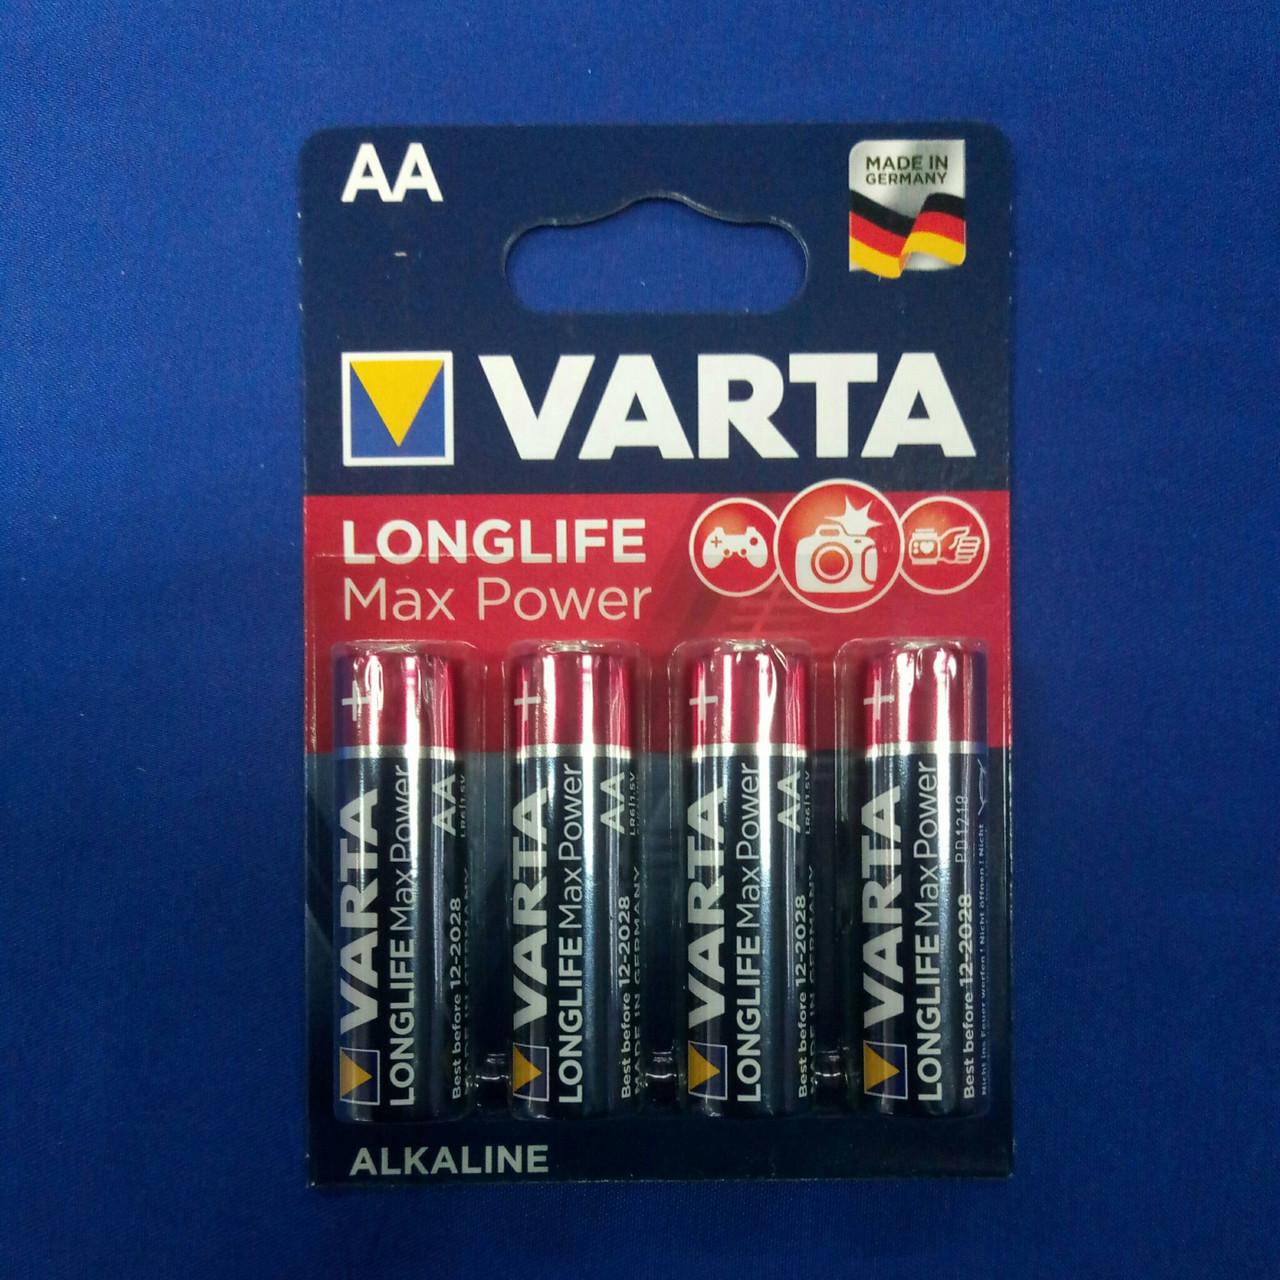 Батарейка пальчиковая Varta LongLife Max Power LR6 ( 4шт. )